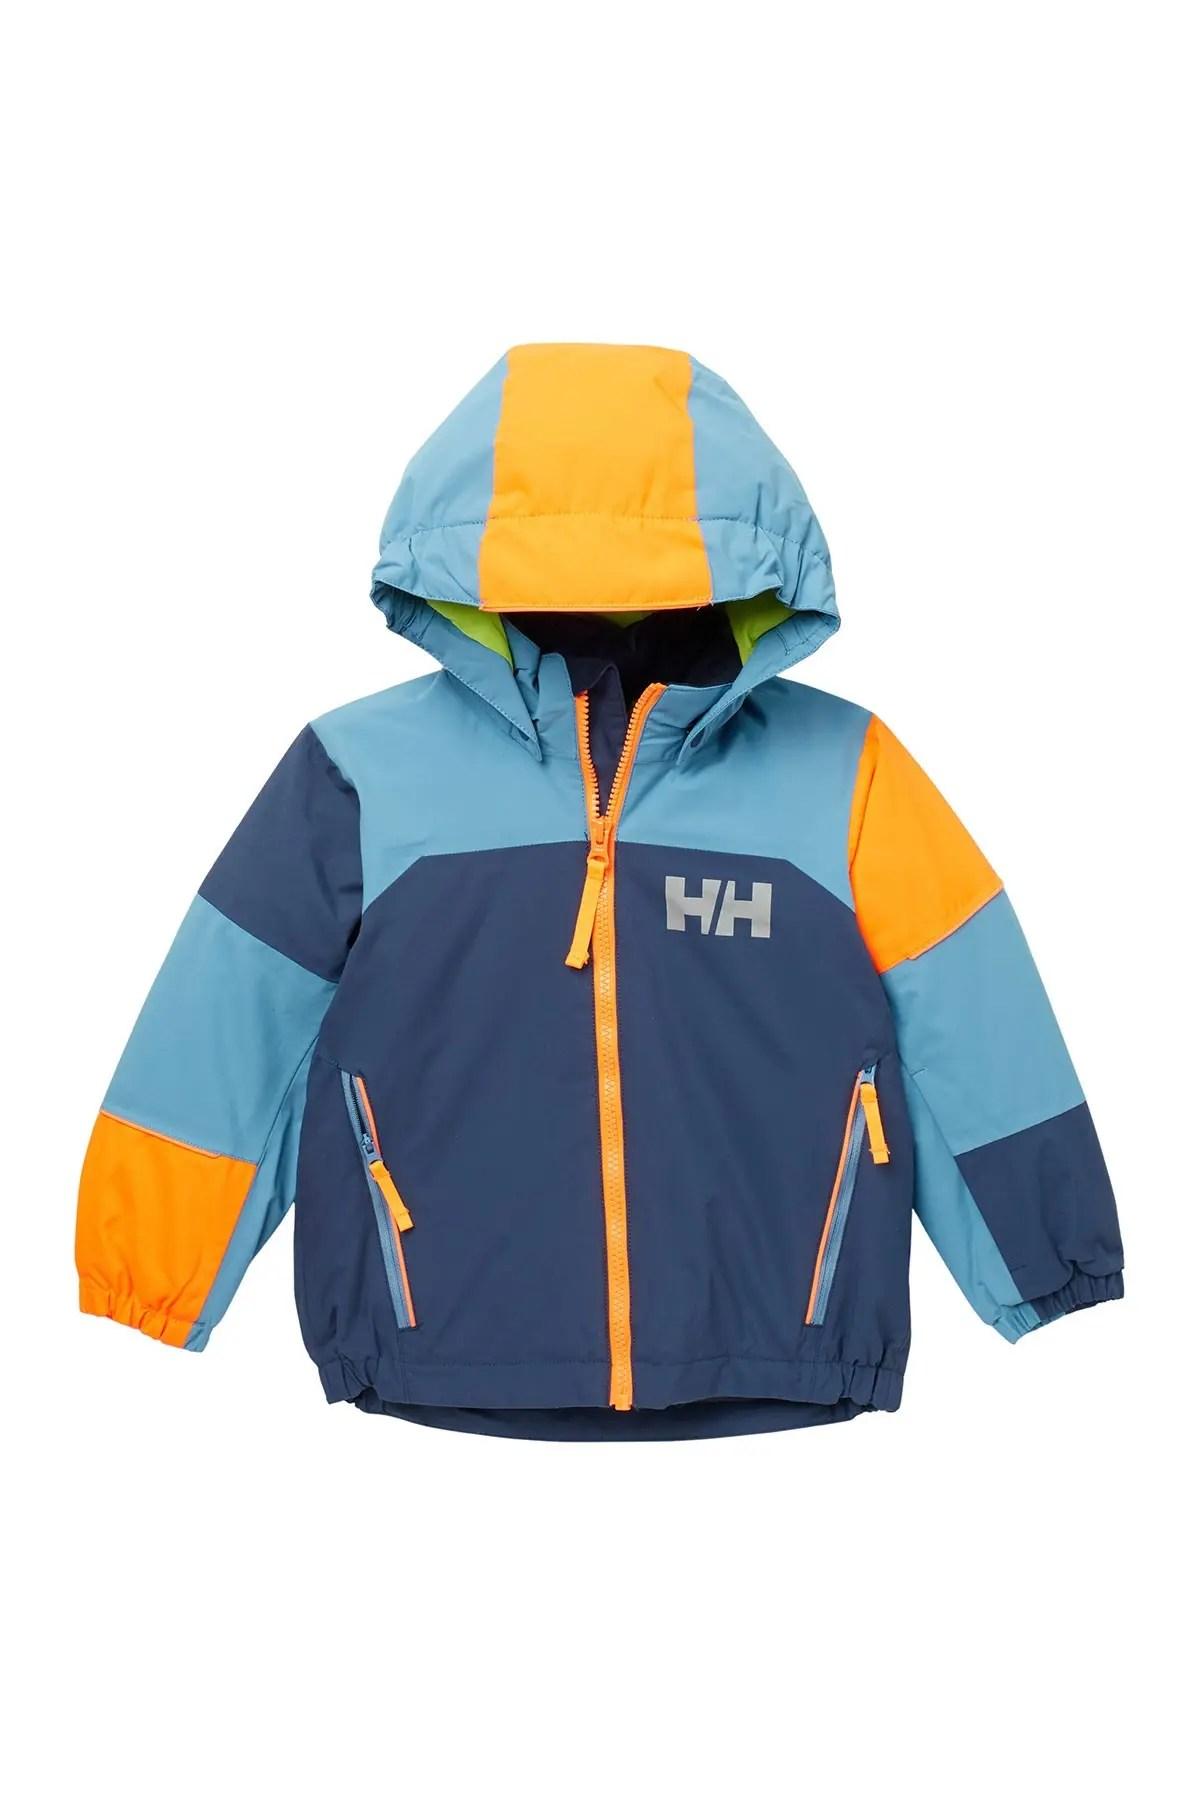 rider 2 insulated jacket